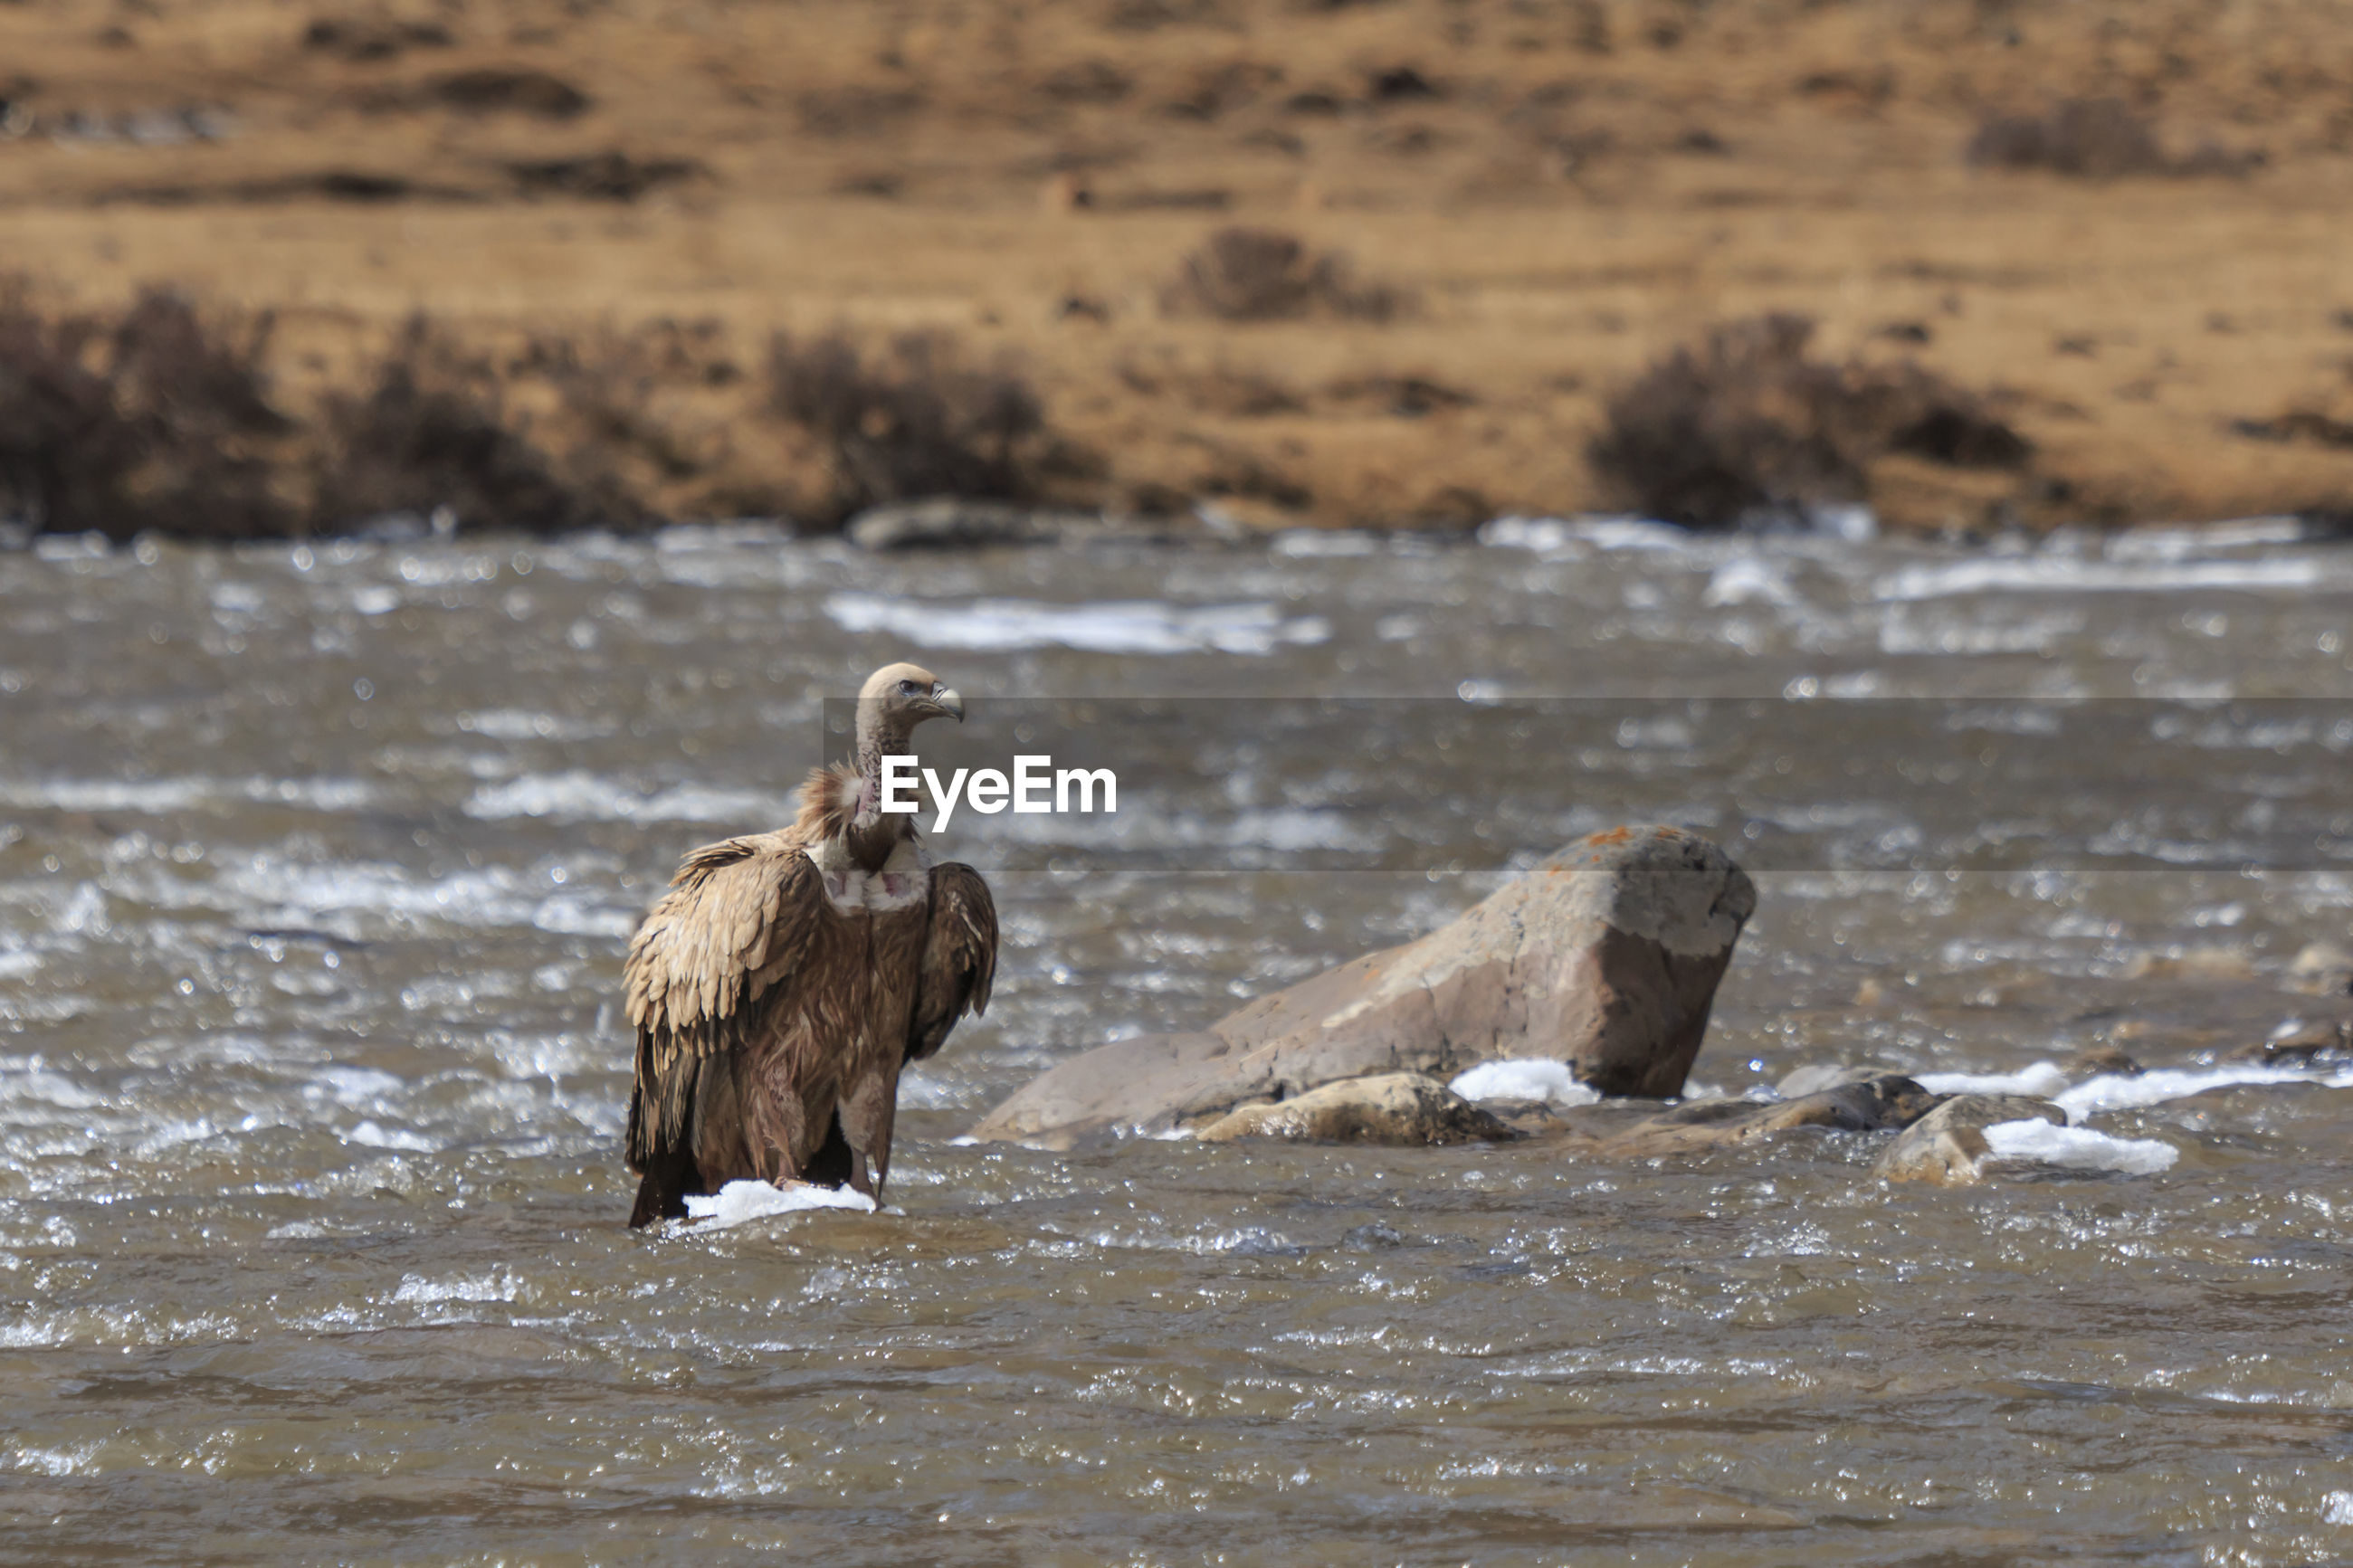 Vulture in lake